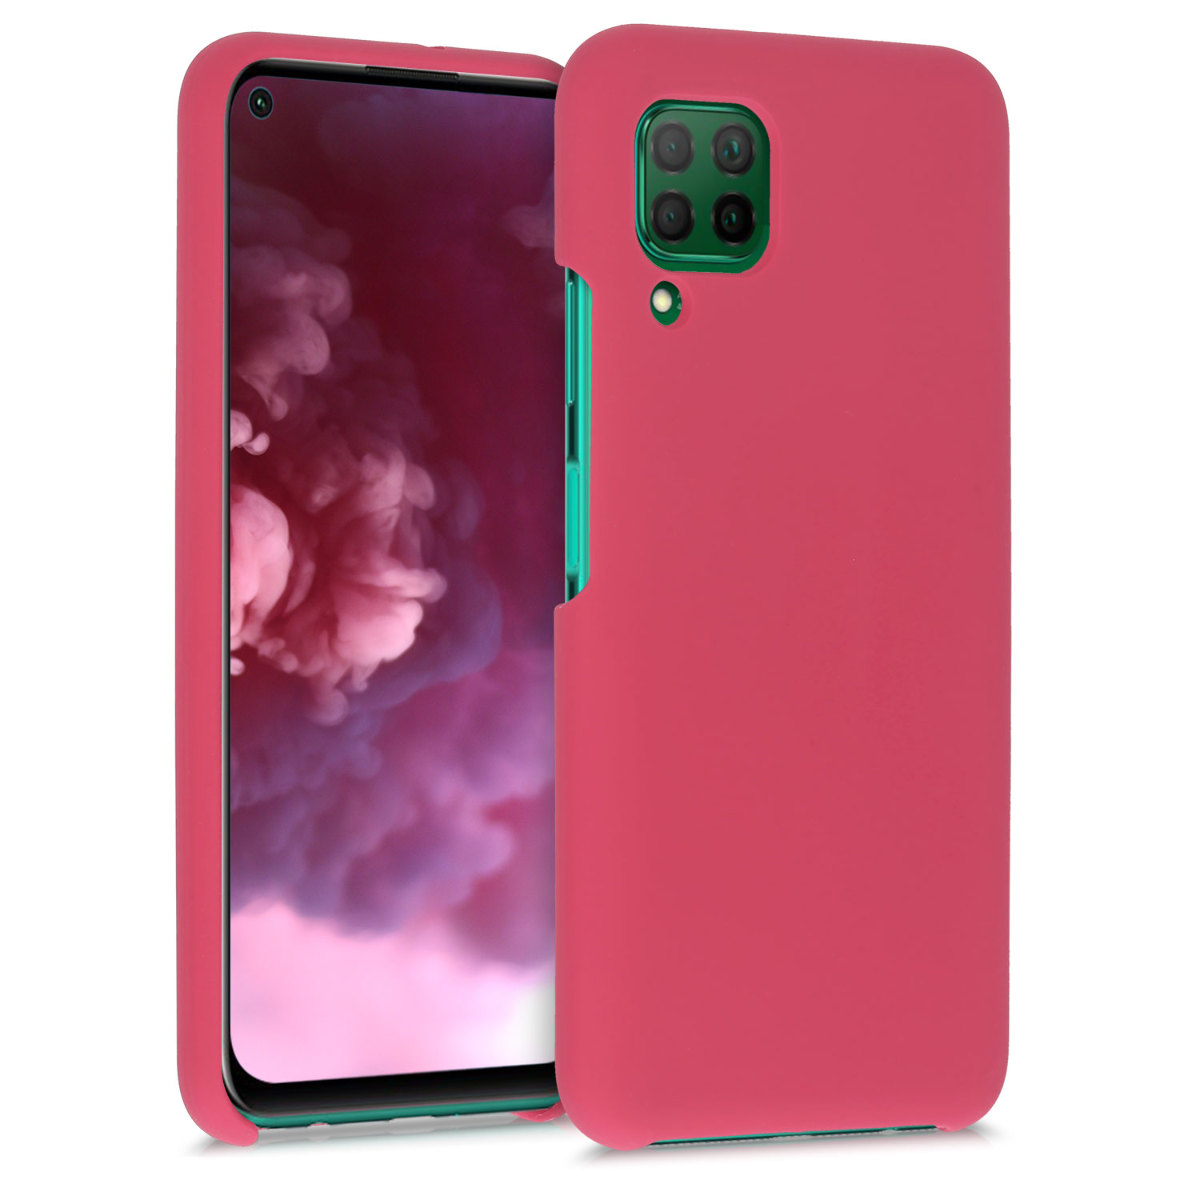 Fuchsiové červené silikonové pouzdro / obal pro Huawei P40 Lite